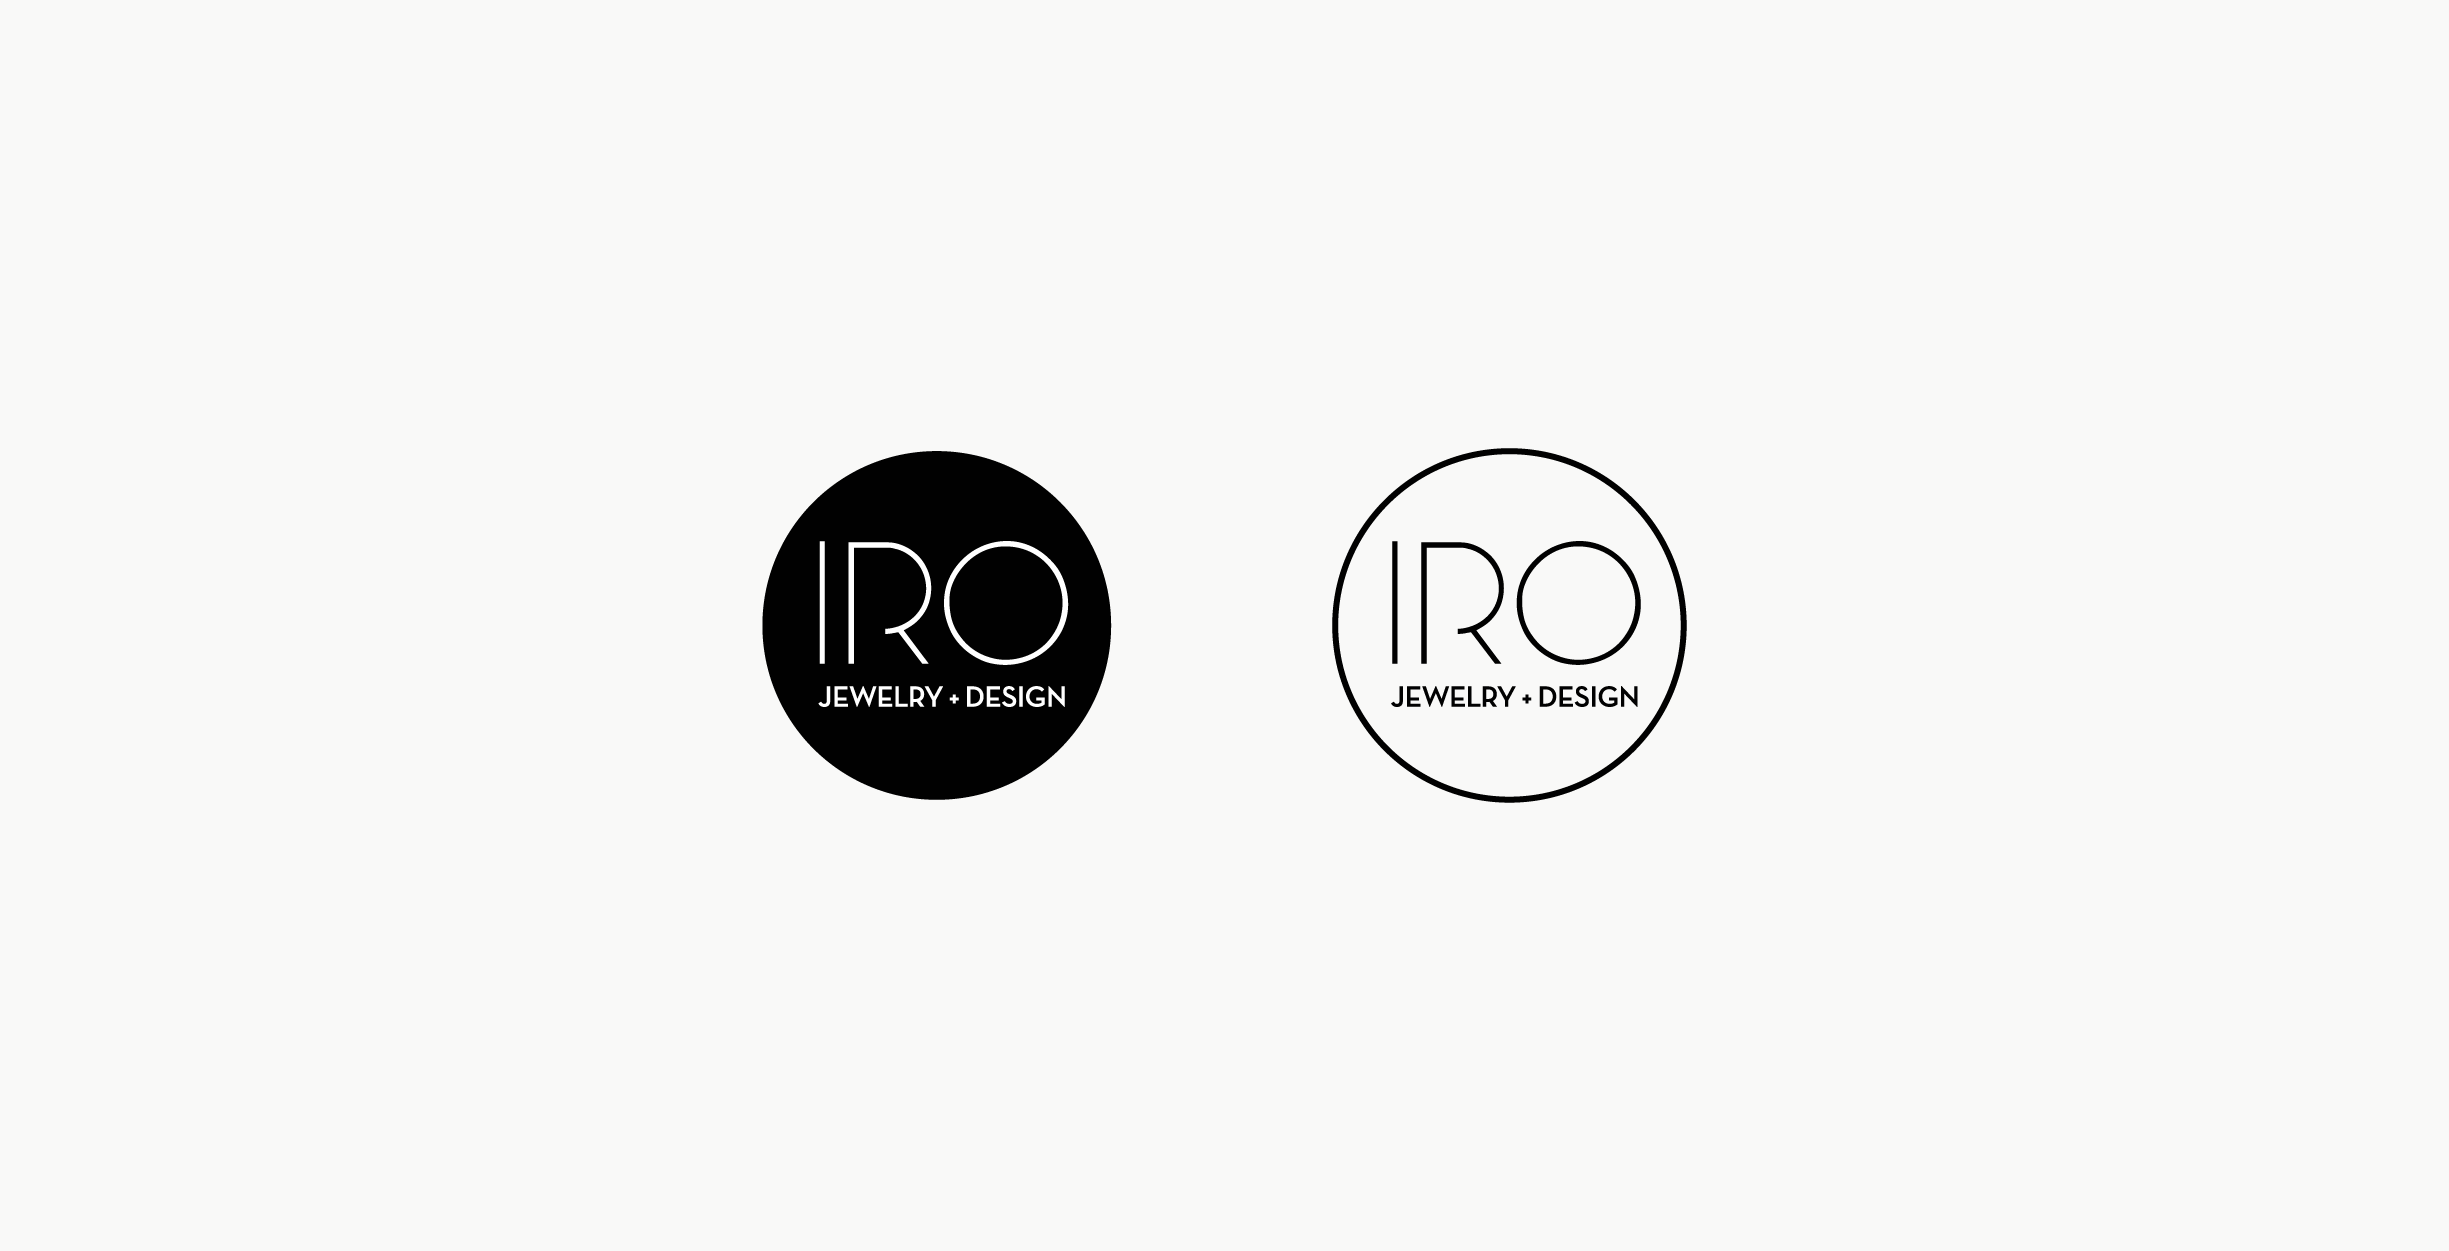 logos-2-v4-10